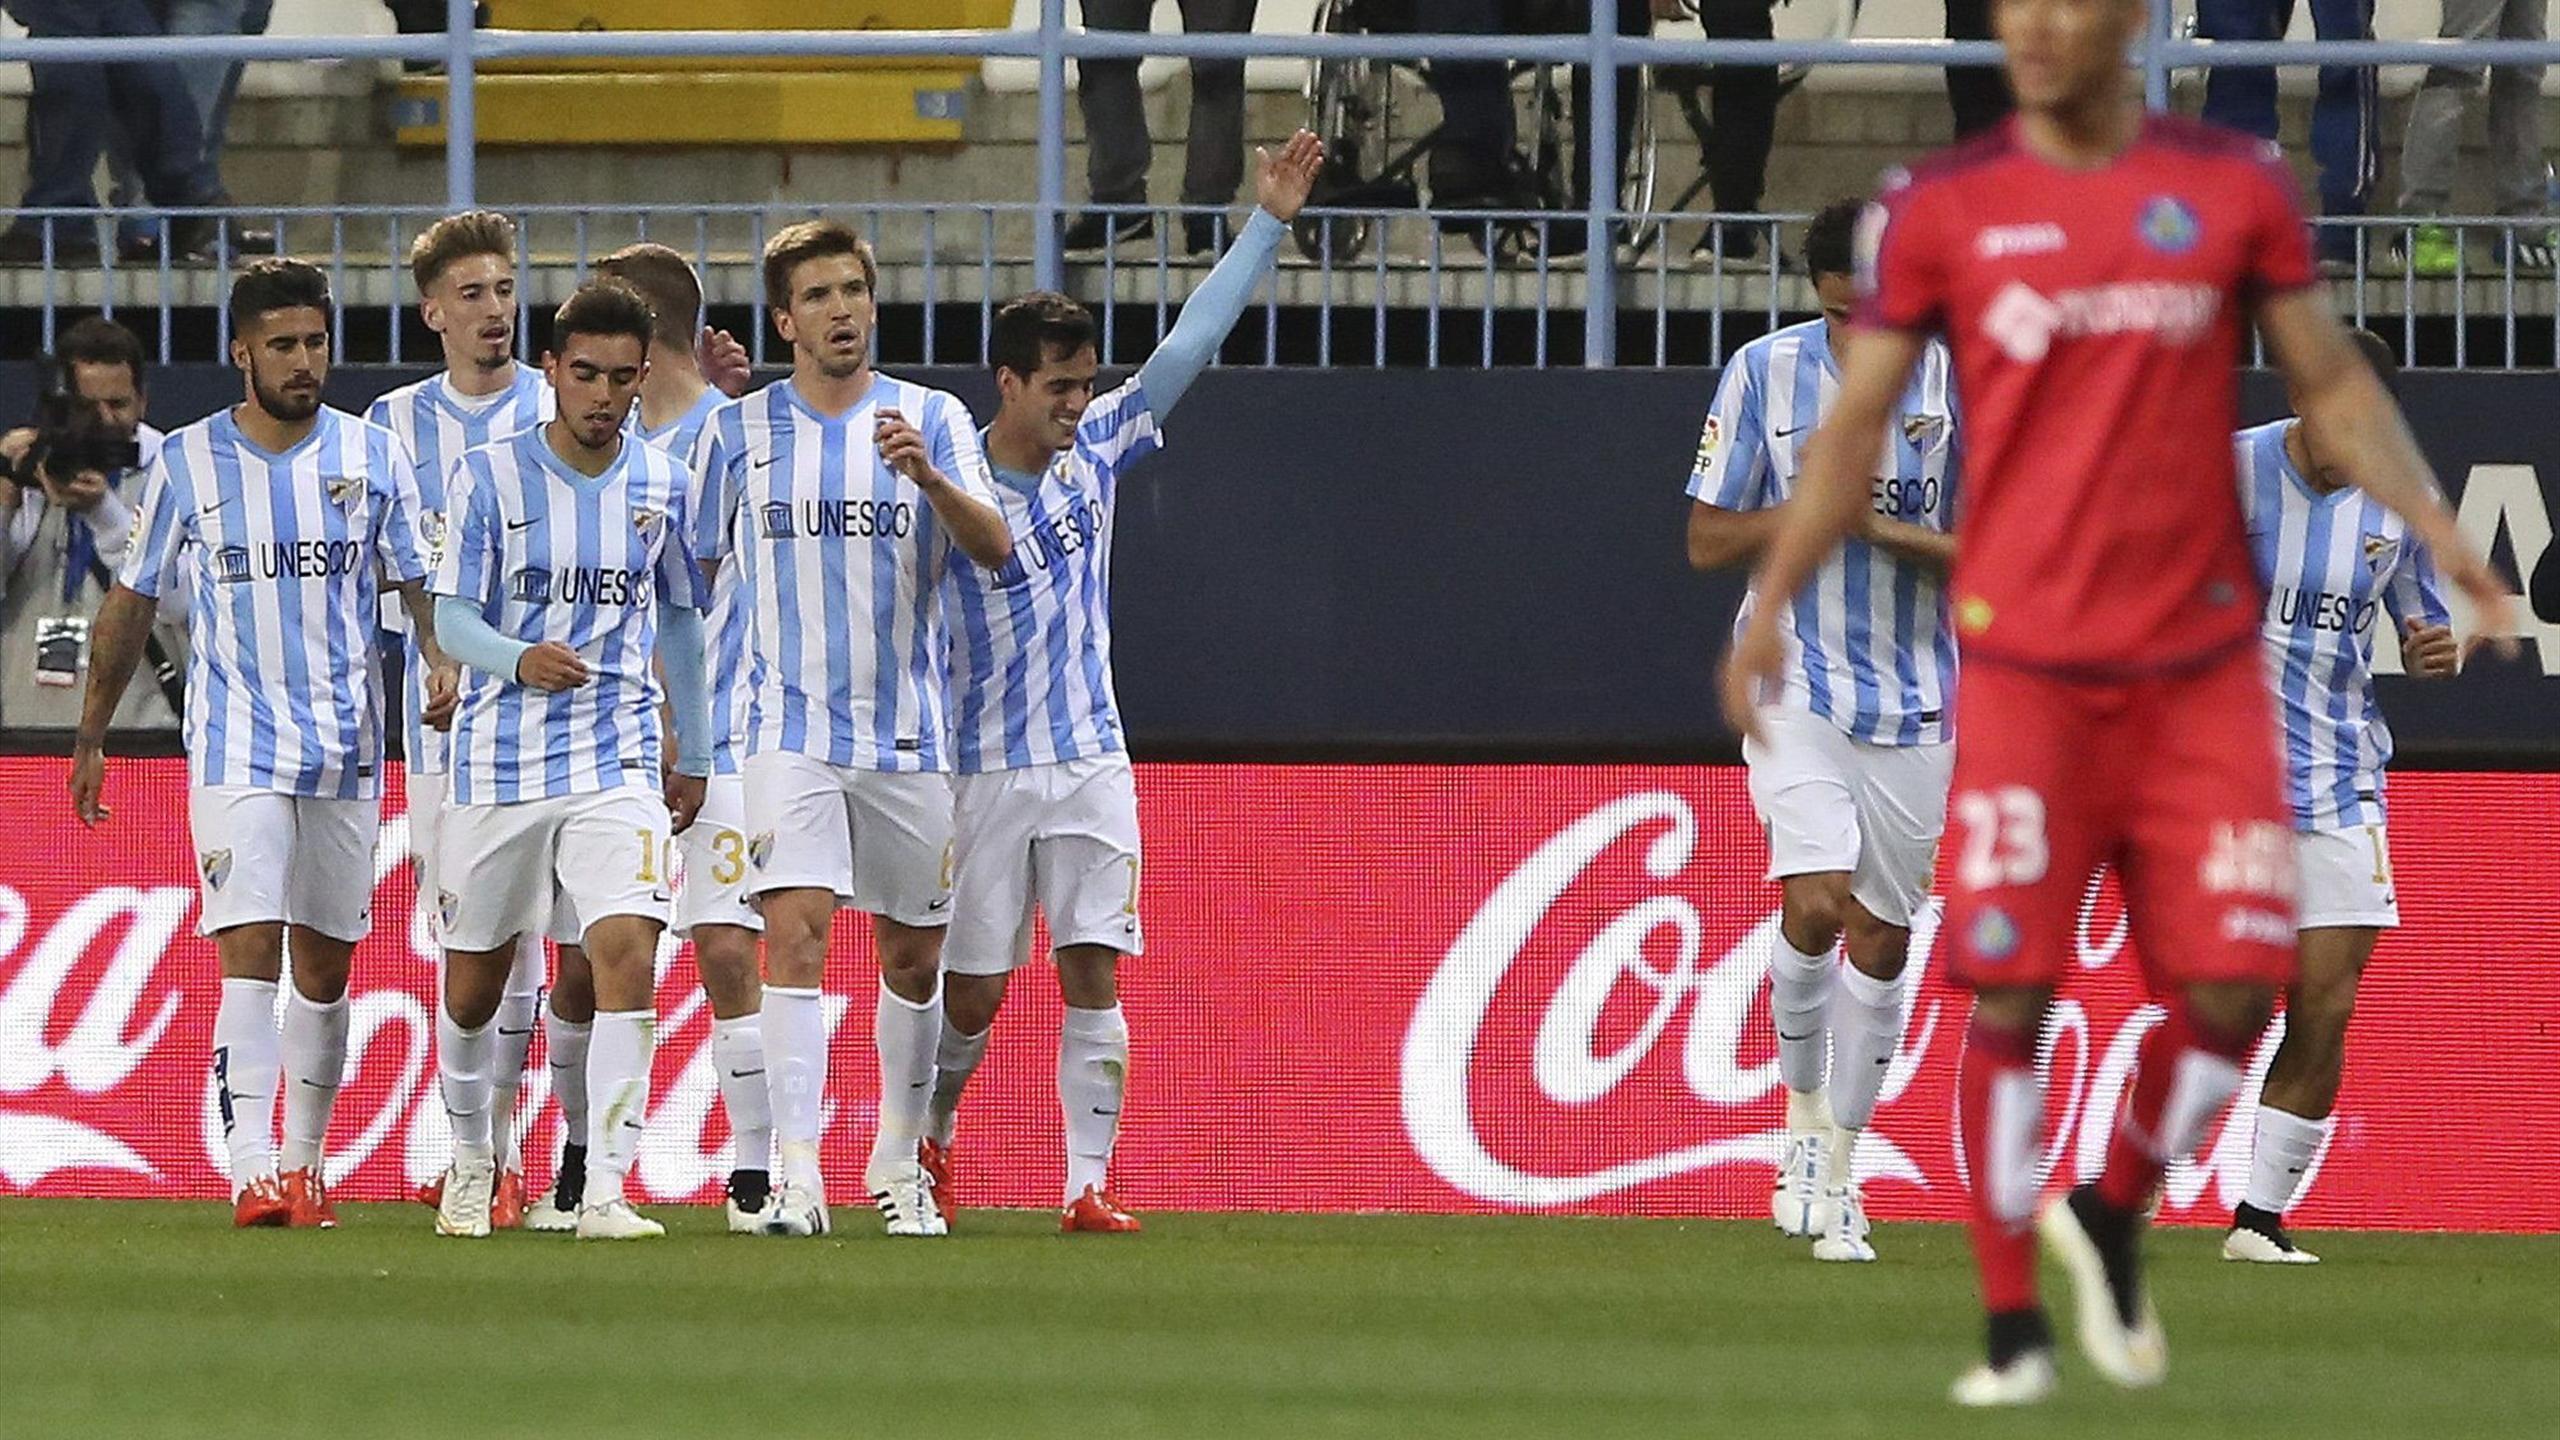 Video: Malaga vs Getafe